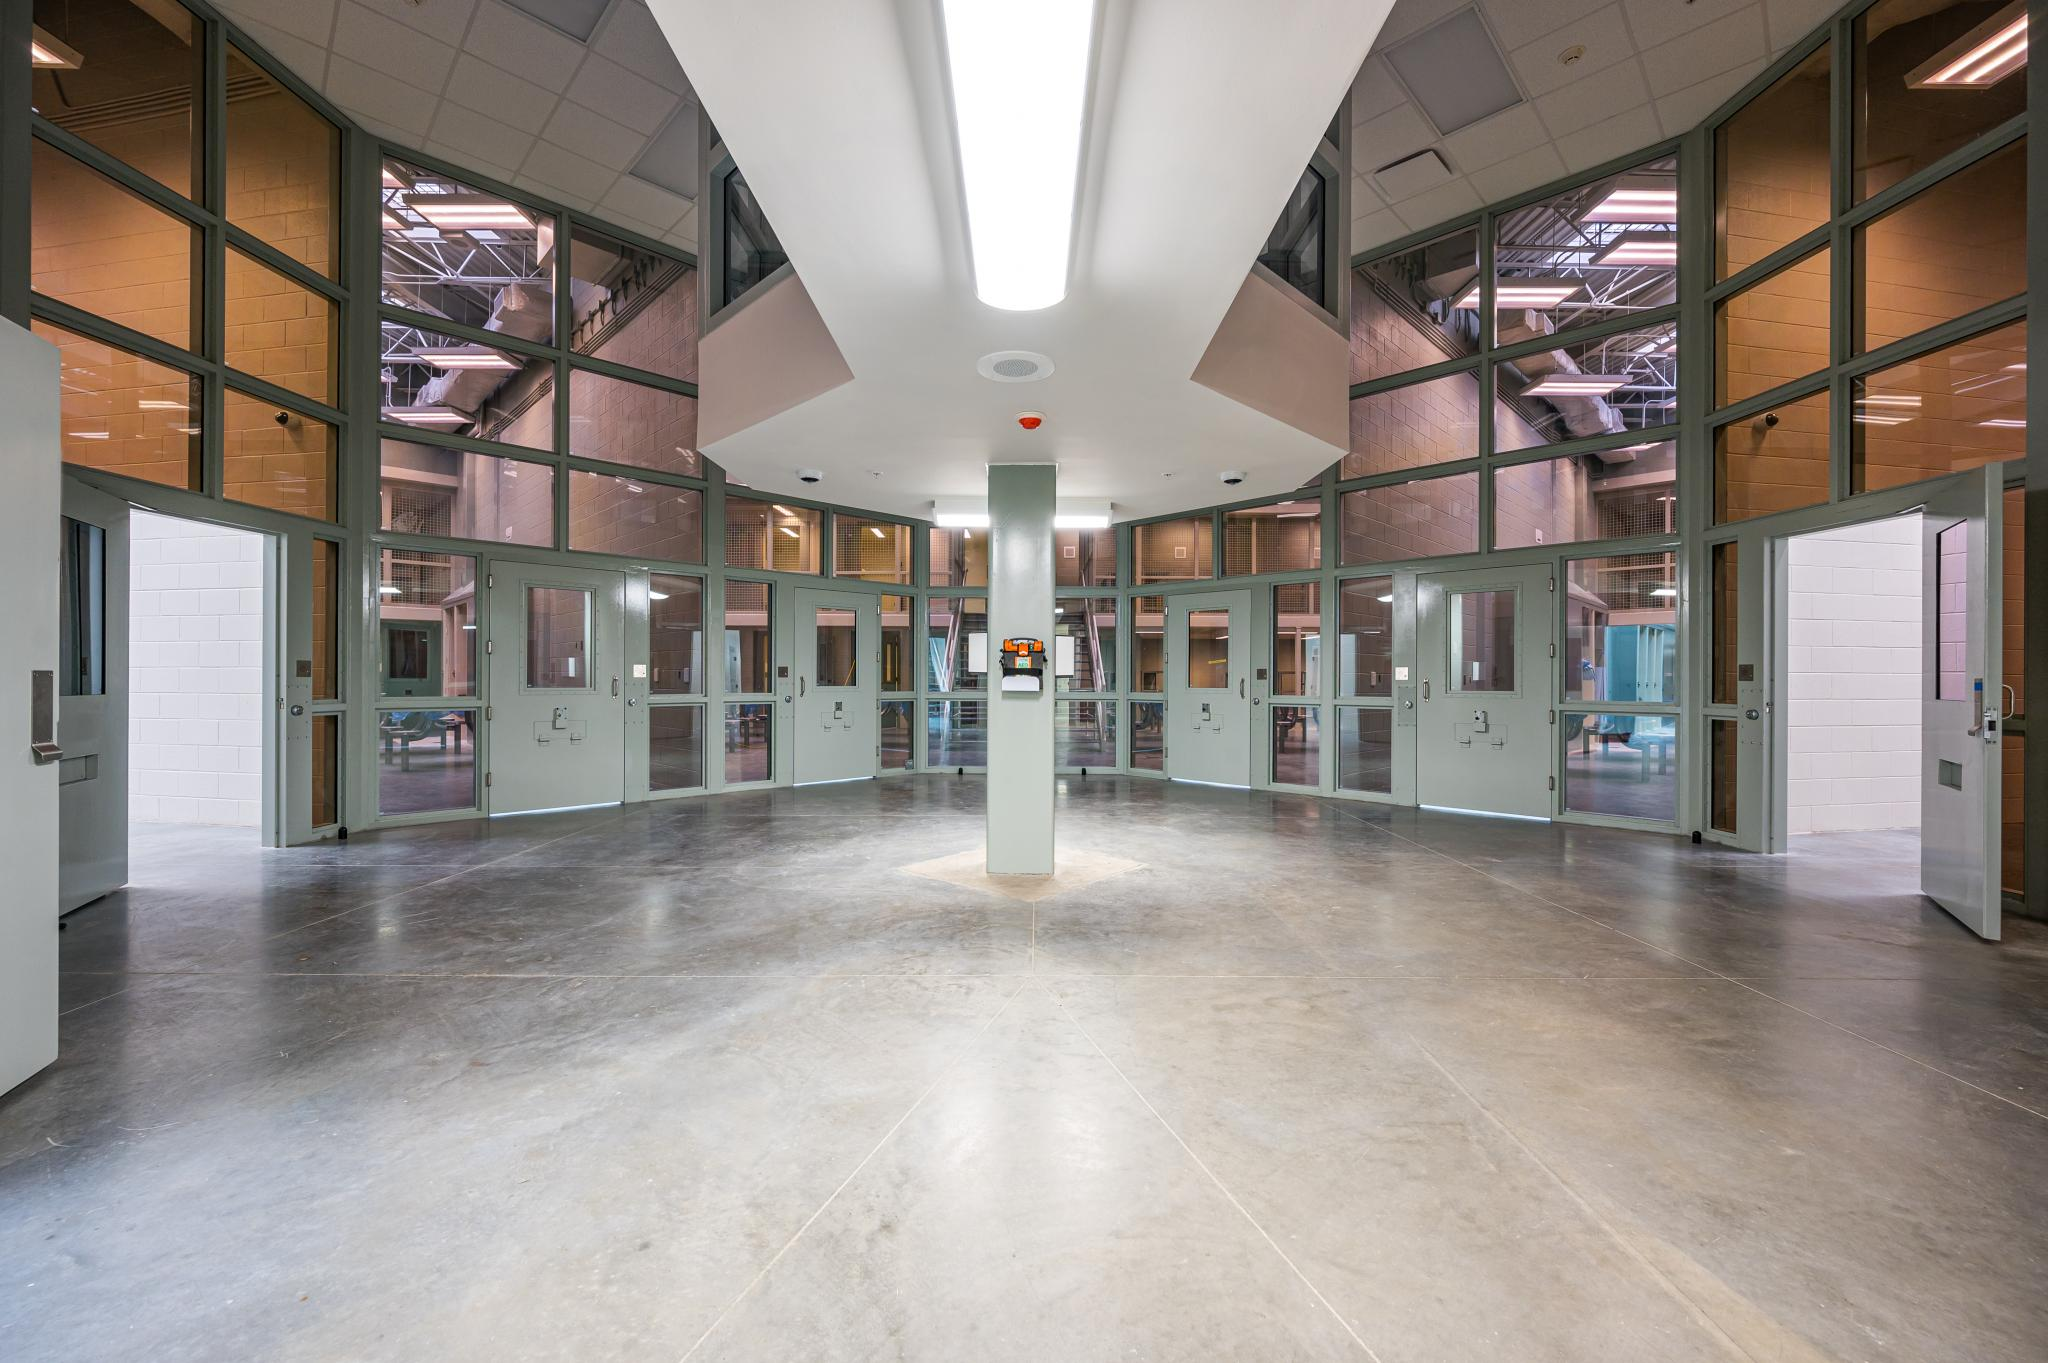 an image of a housing pod at a jail